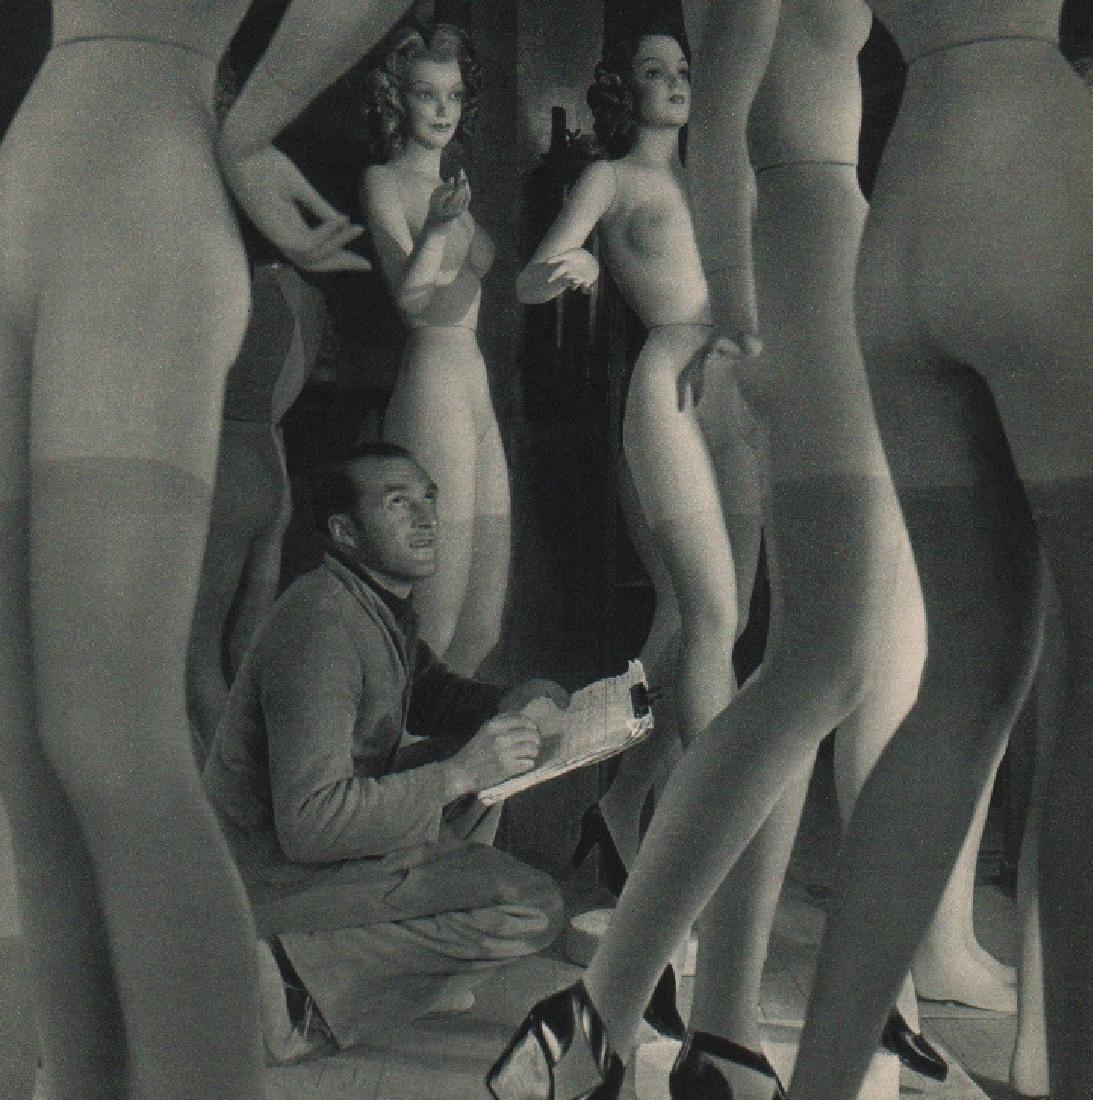 ROBERT DOISNEAU: Pierre Imans, Window Dresser